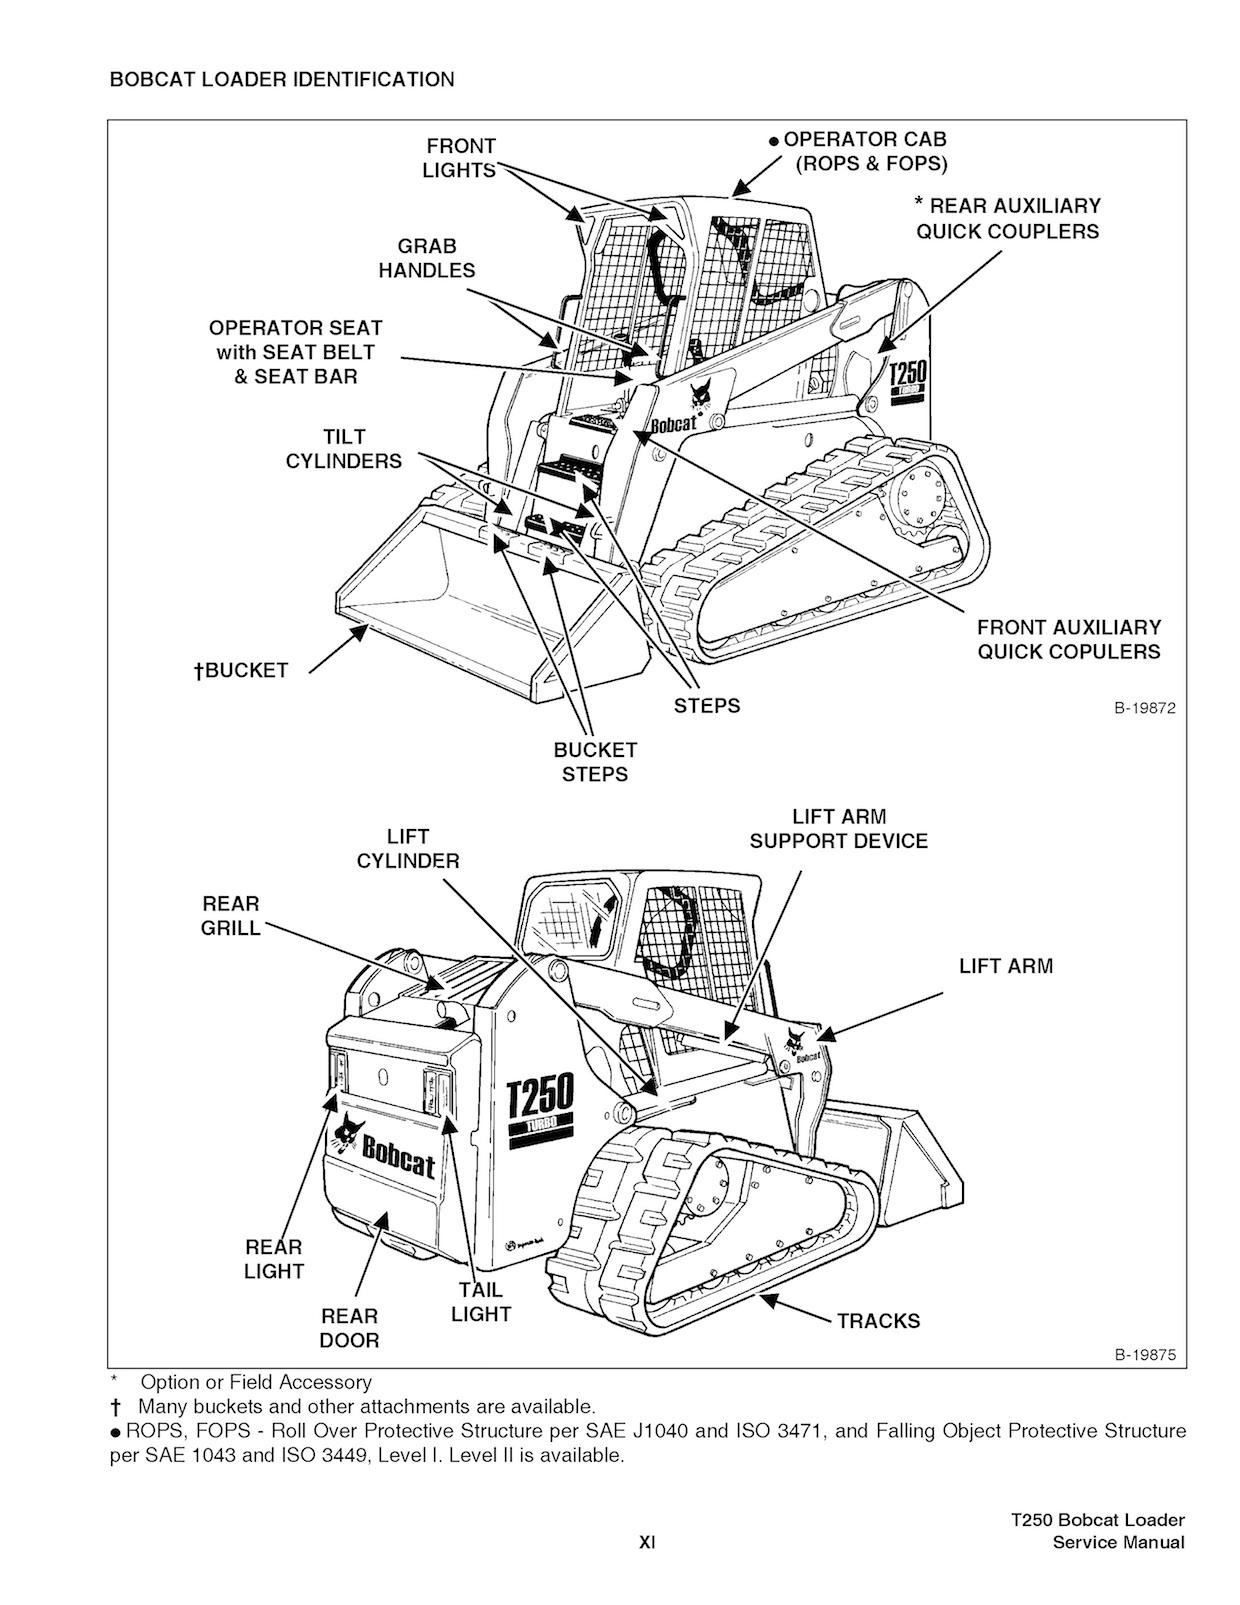 hight resolution of bobcat t250 parts diagram wiring diagram used bobcat t 250 parts catalog bobcat t250 parts diagram